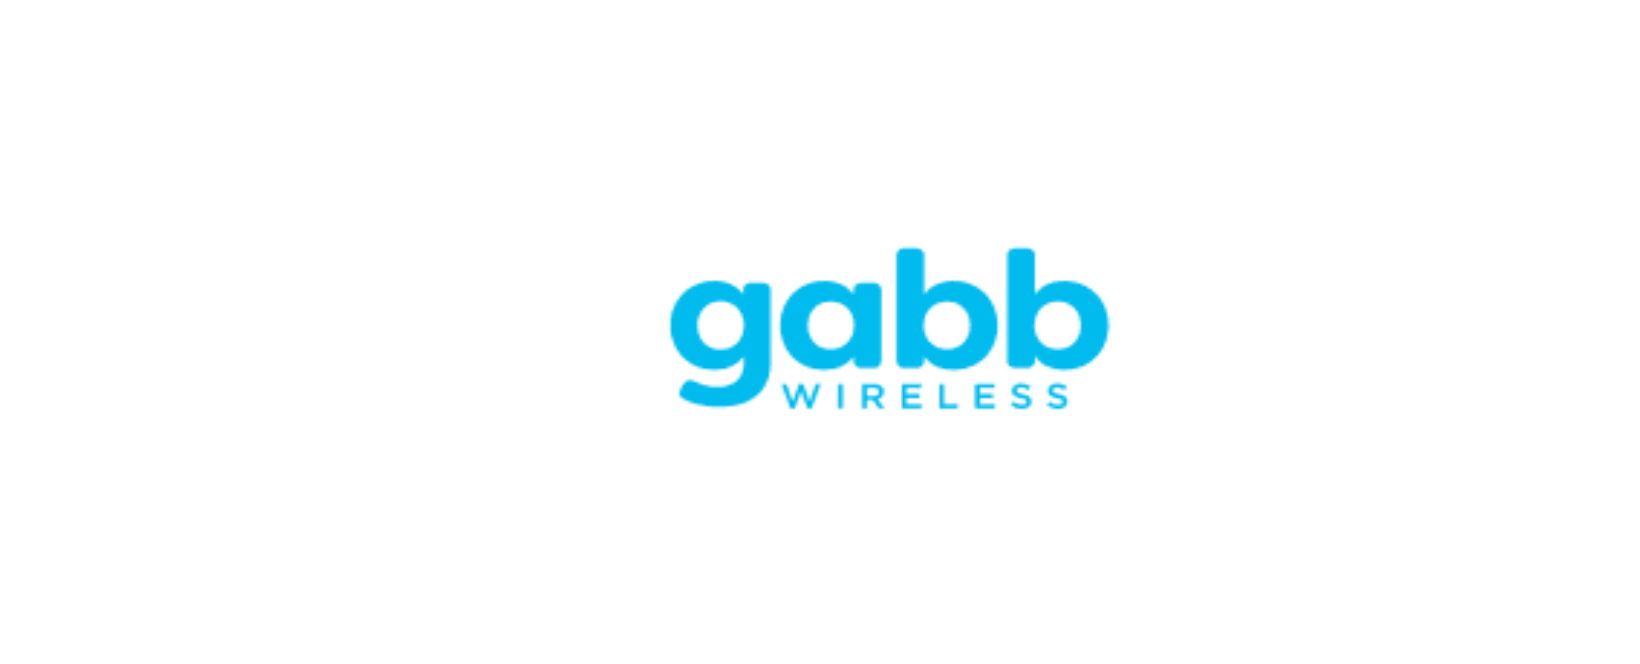 Gabb Wireless Discount Code 2021